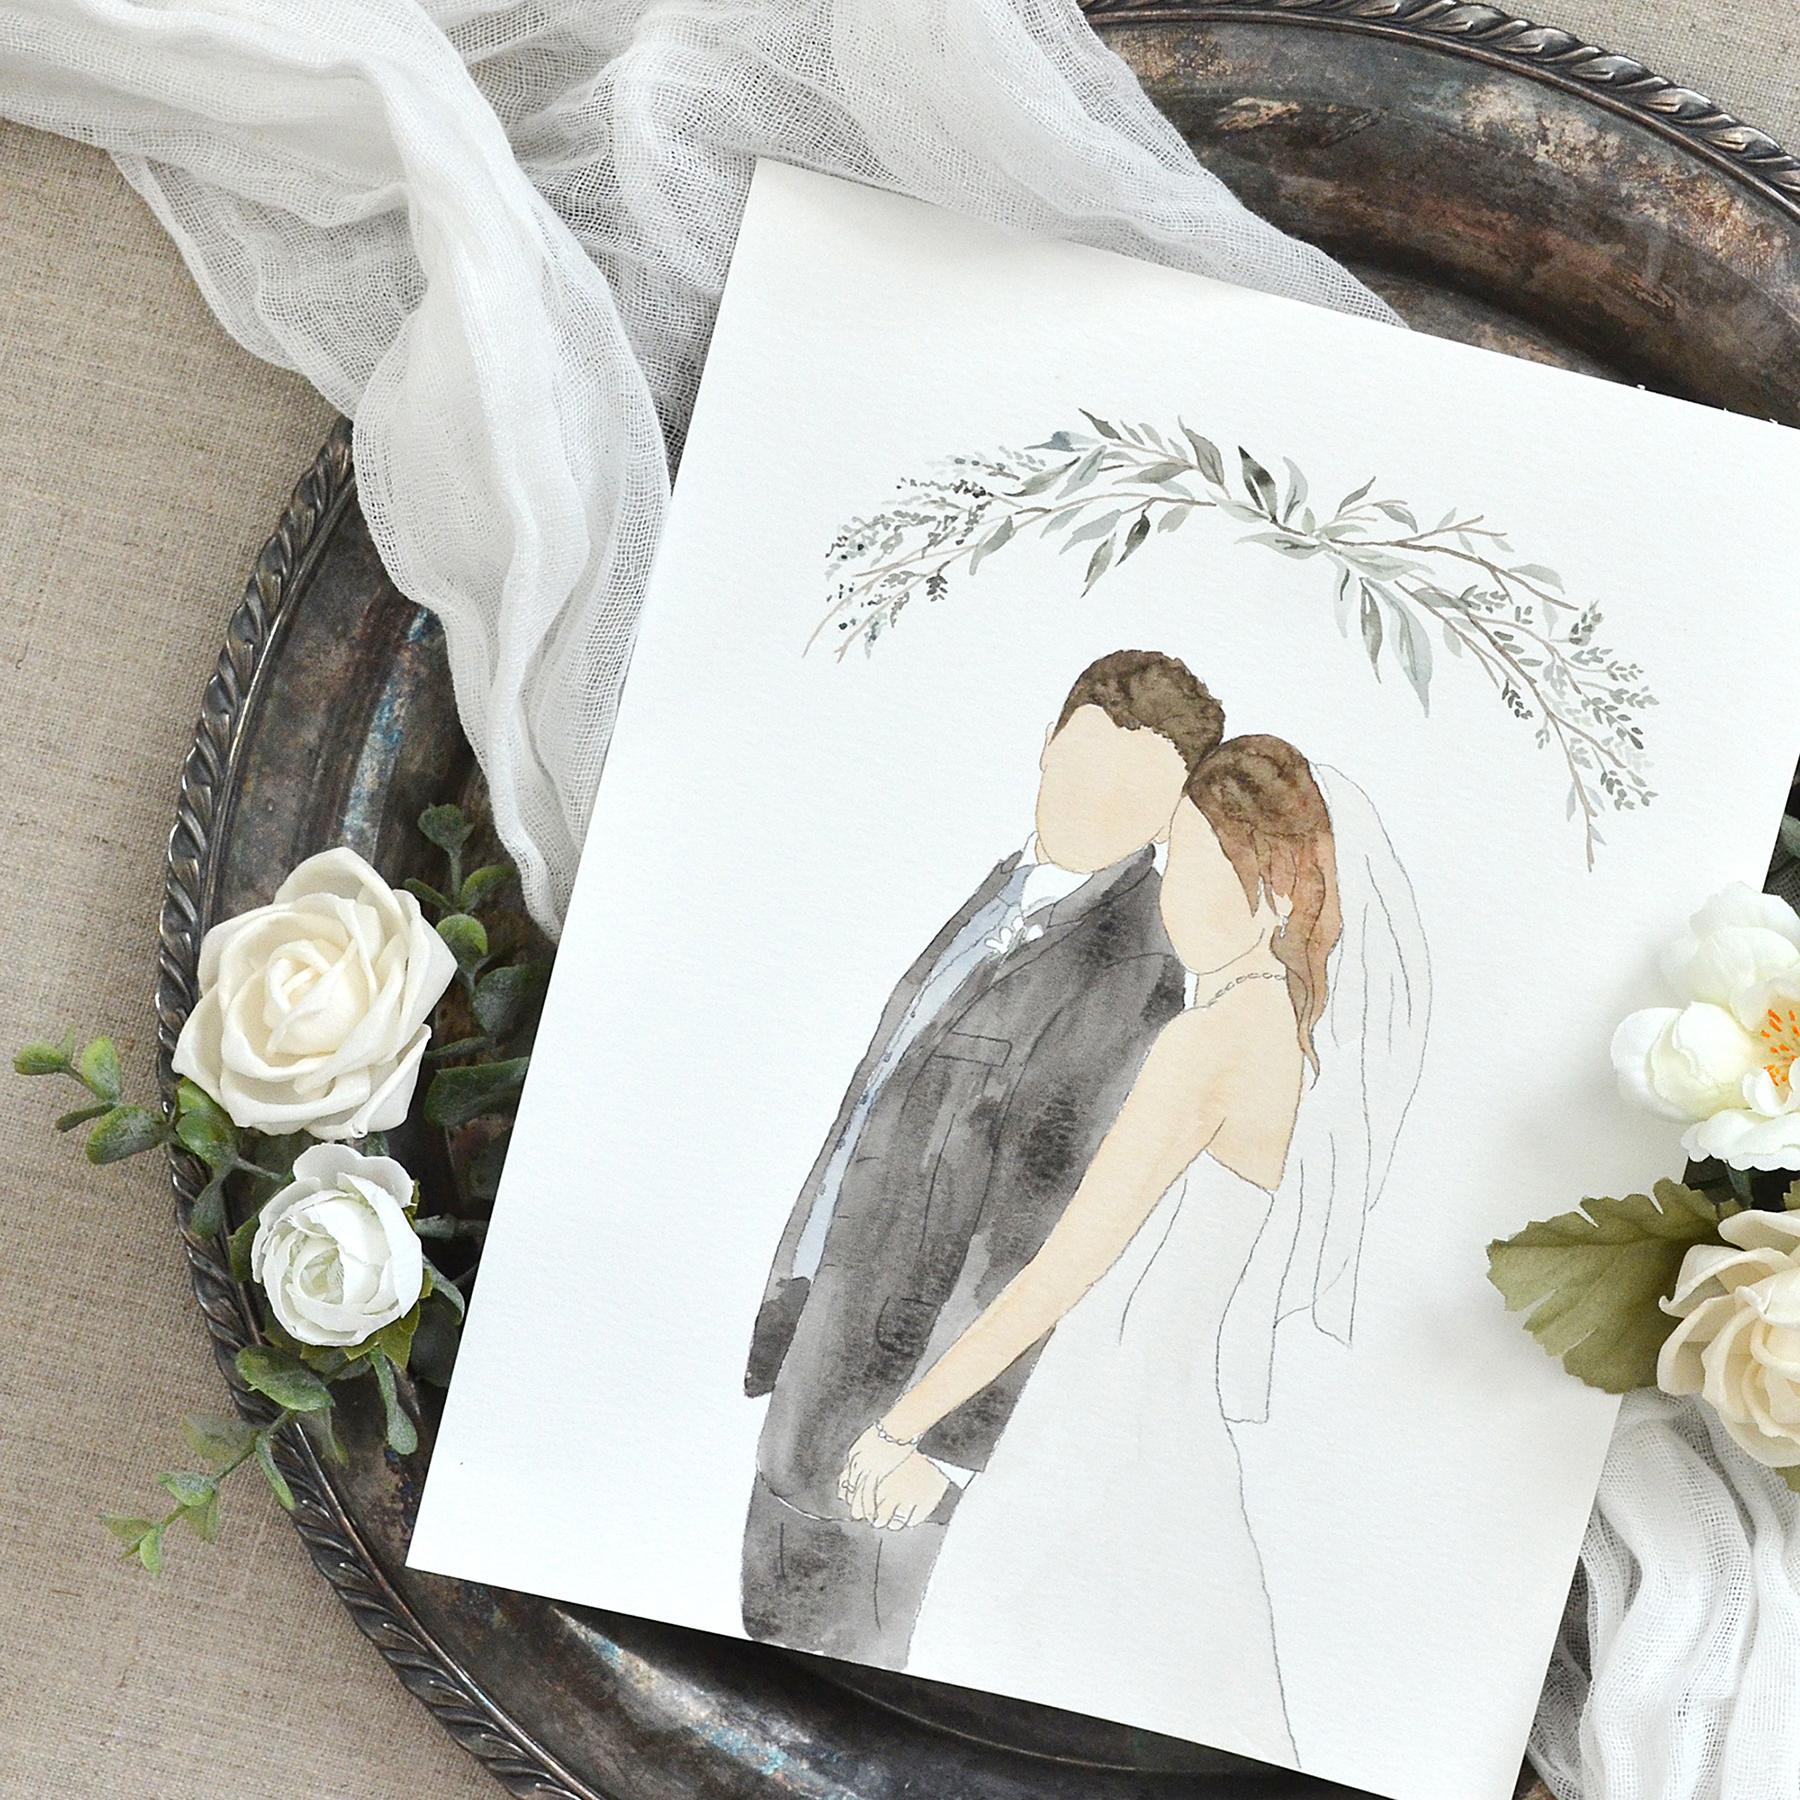 Sam Allen Creates – Watercolor Faceless Wedding Portrait for Paper Anniversary Gift